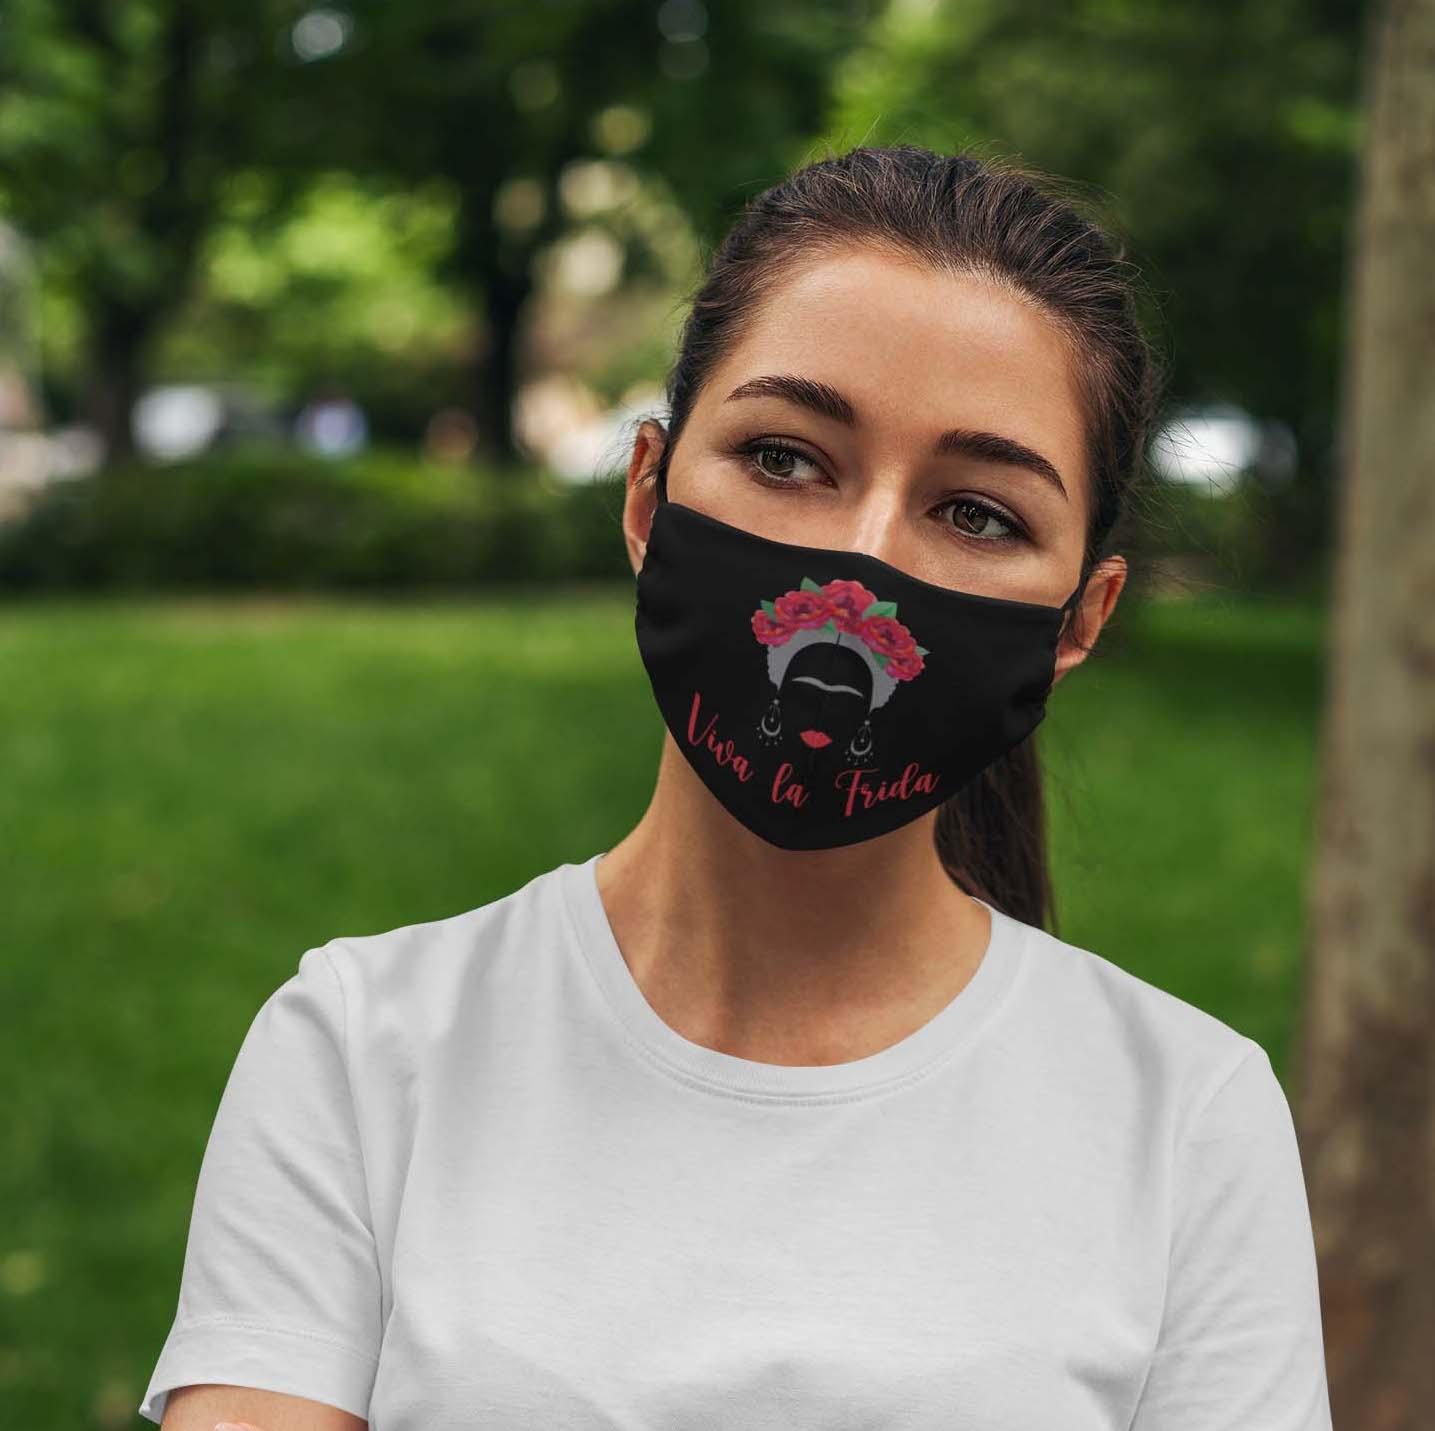 Viva la frida kahlo feminist anti pollution face mask 4